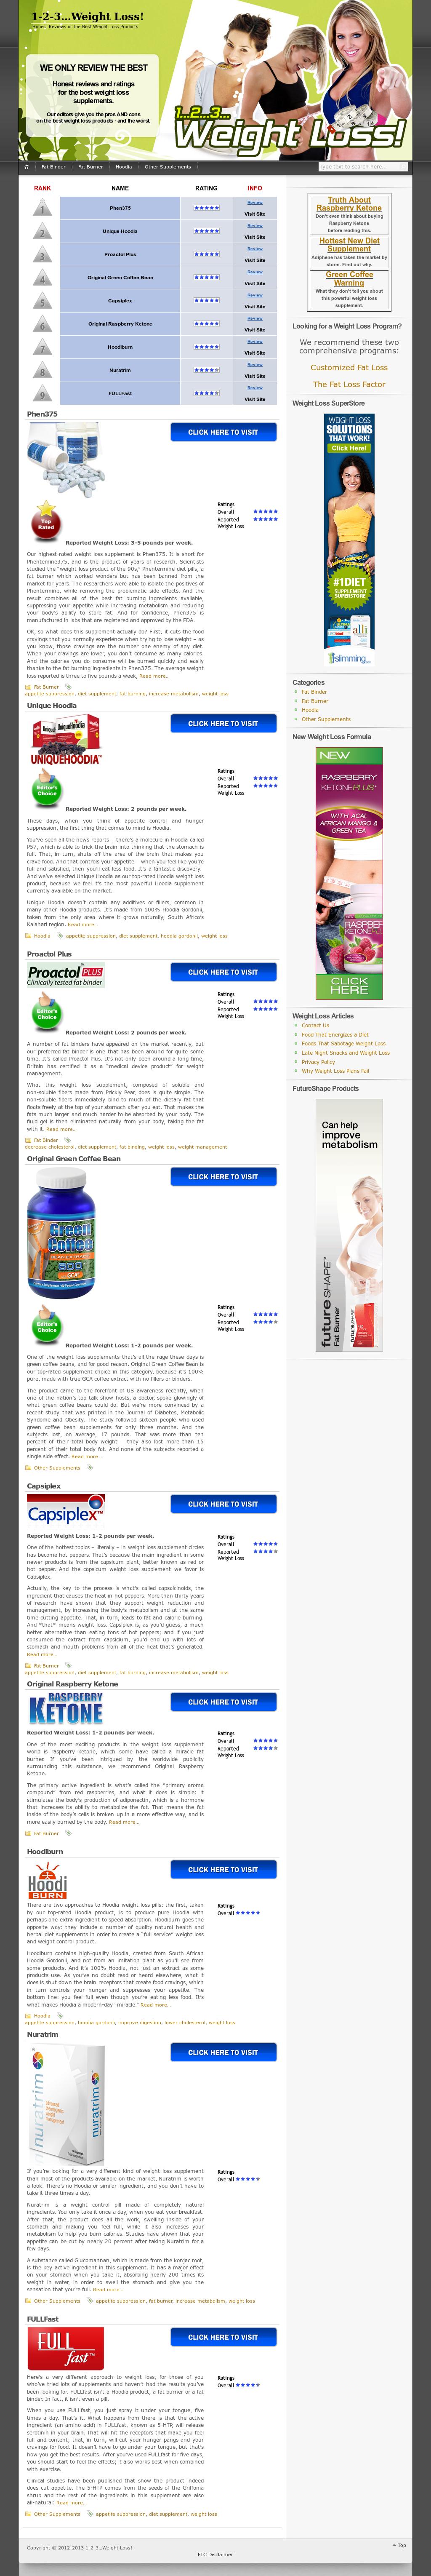 Hiit 100 6 week fat loss transformation pdf photo 3